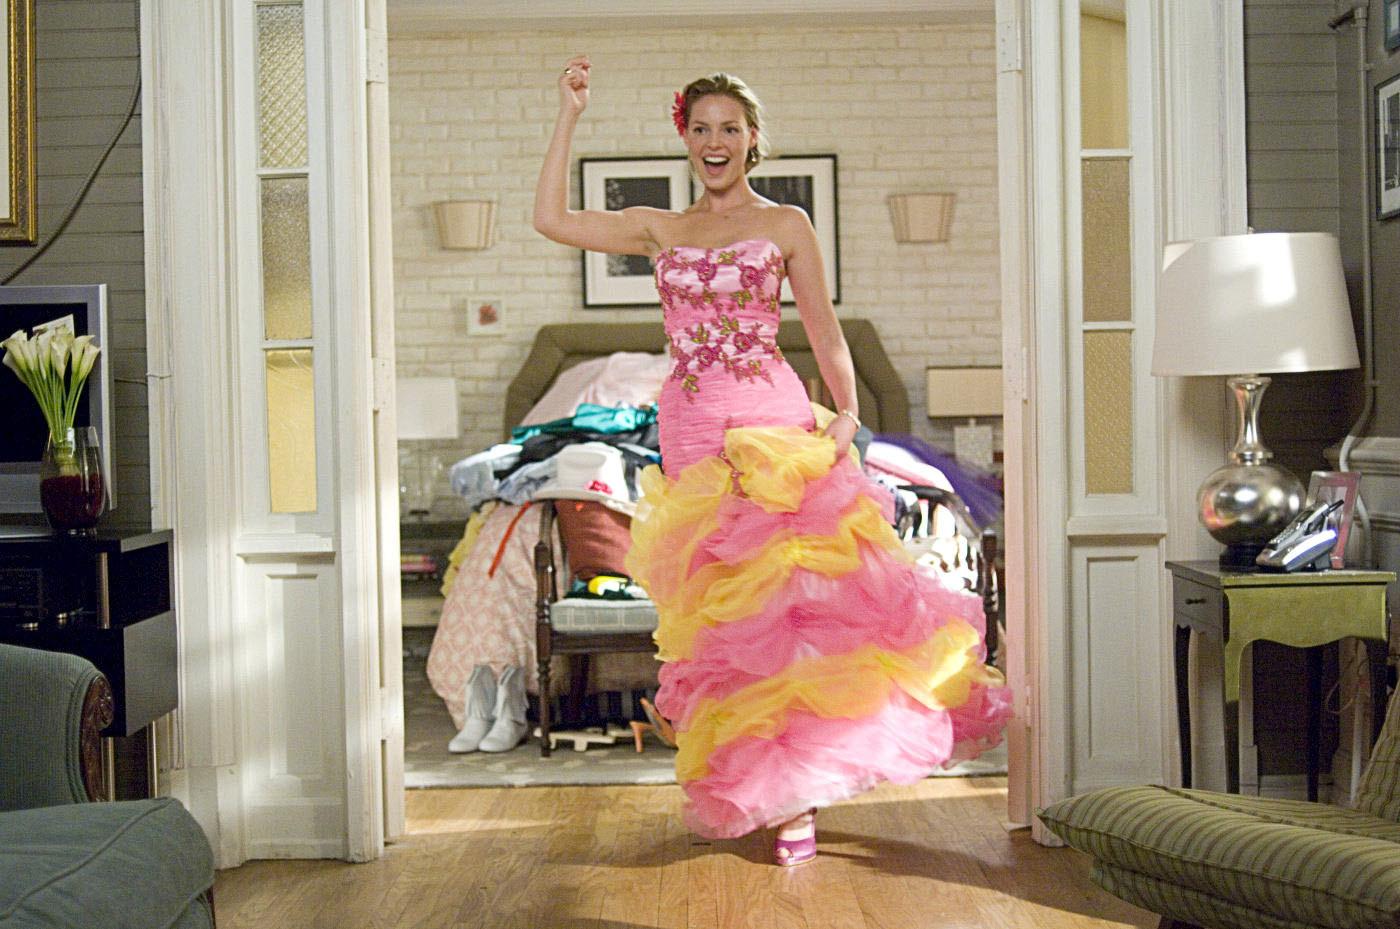 Katherine Heigl in the movie 27 dresses